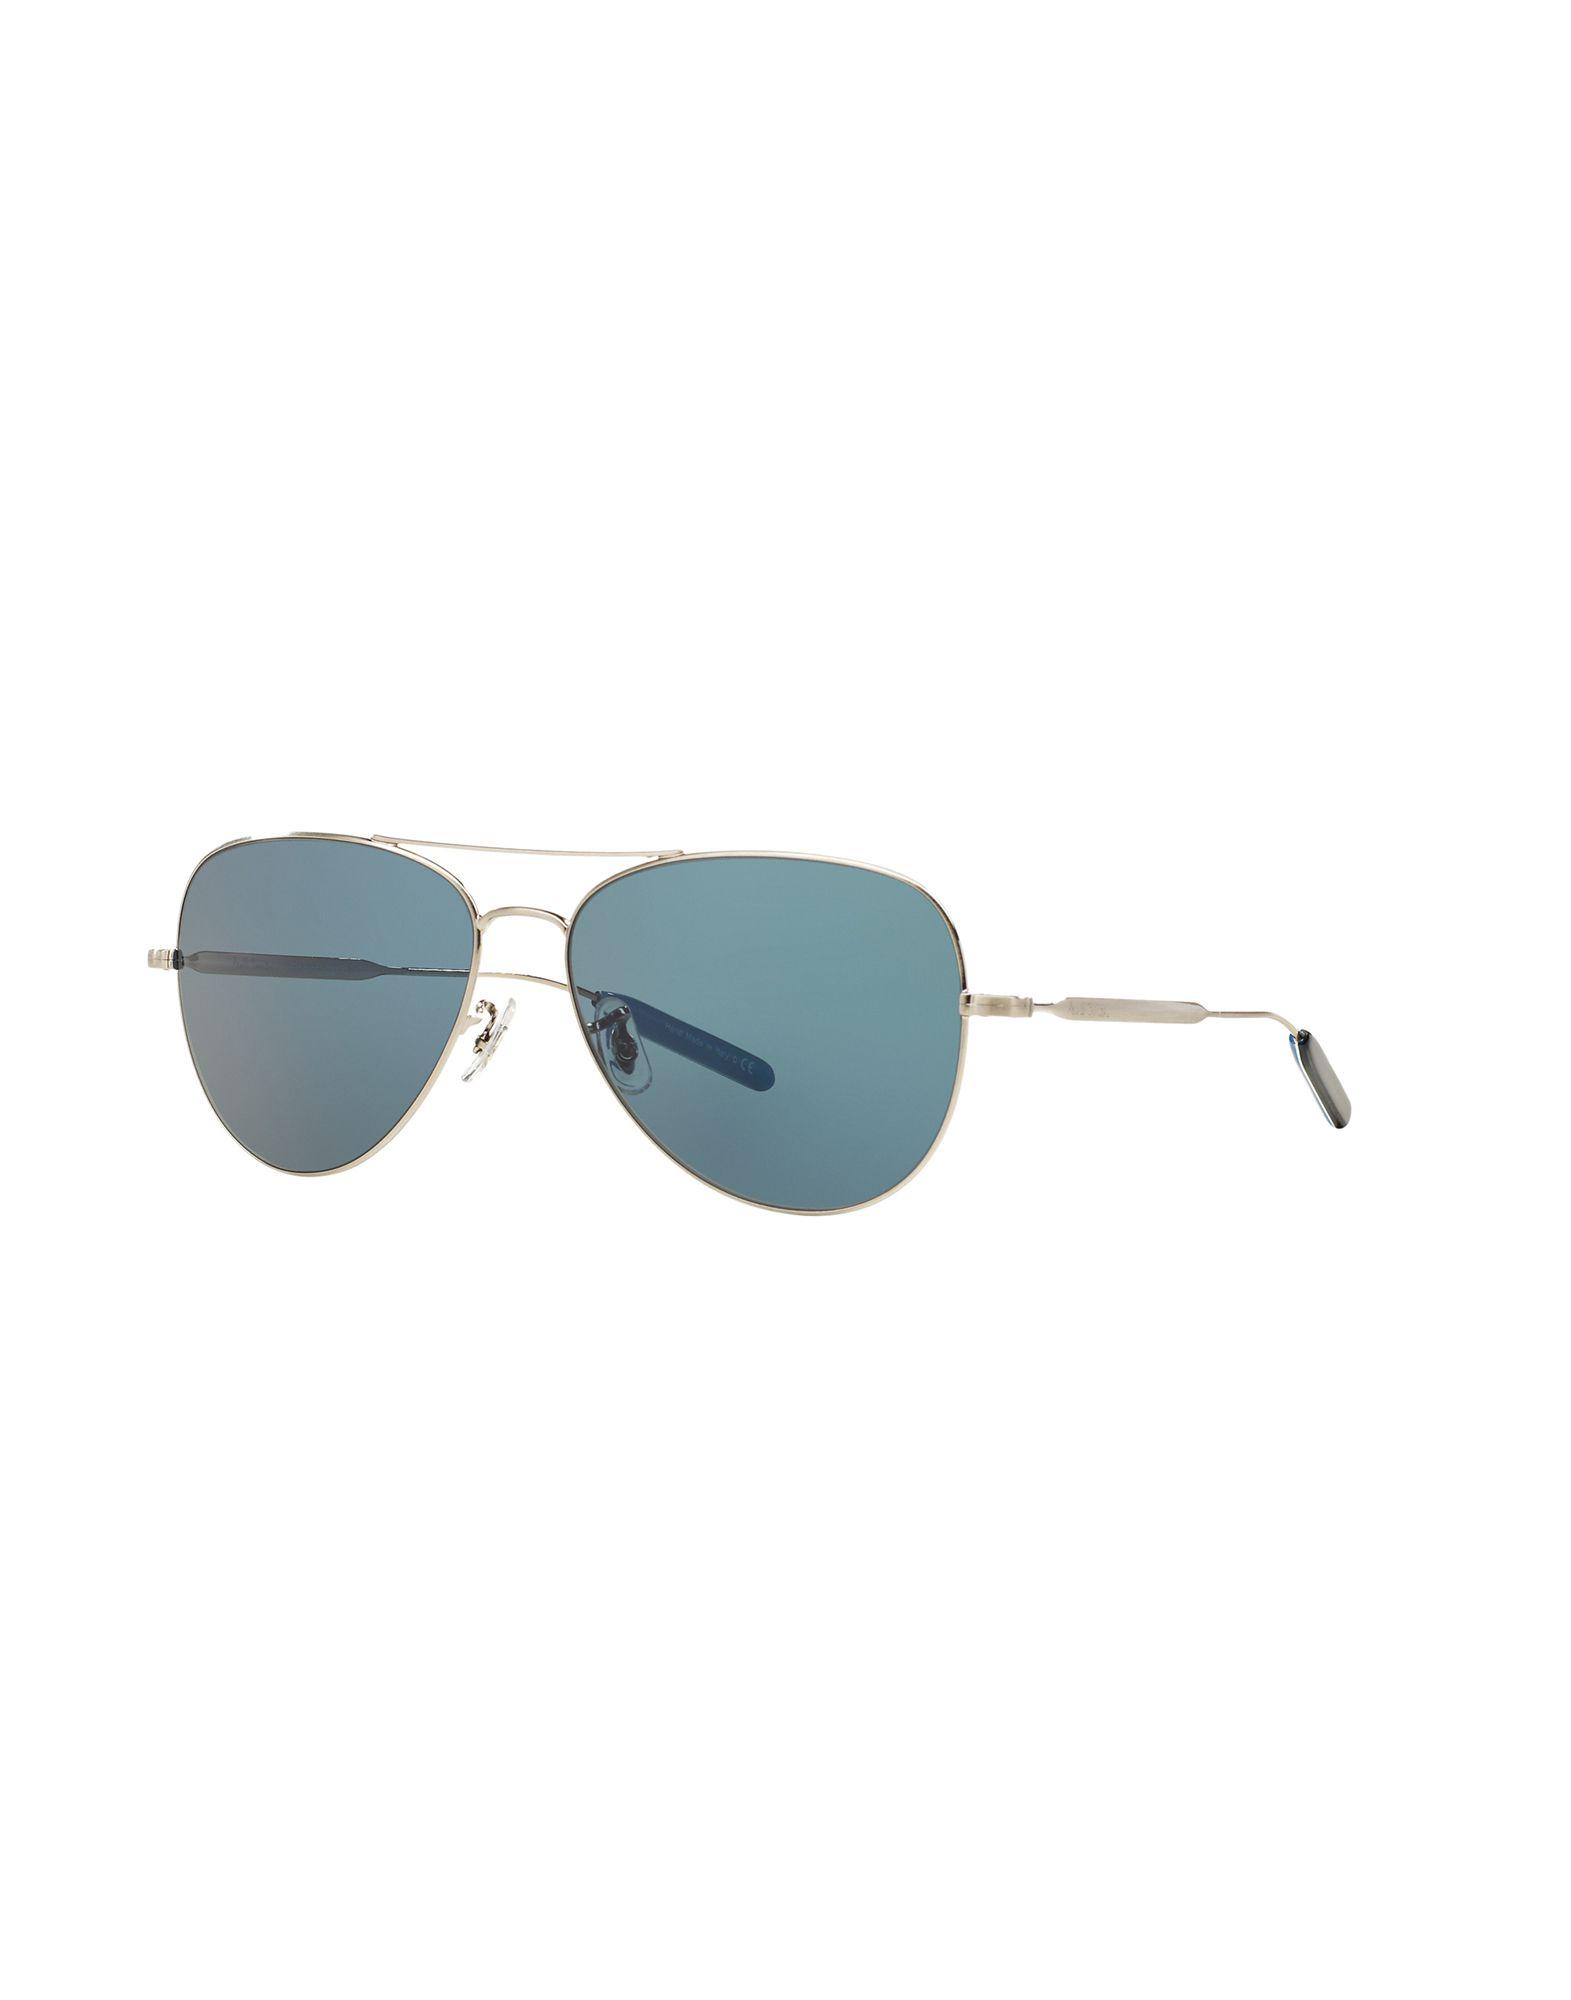 Фото - PAUL SMITH Солнечные очки jean paul gaultier le male